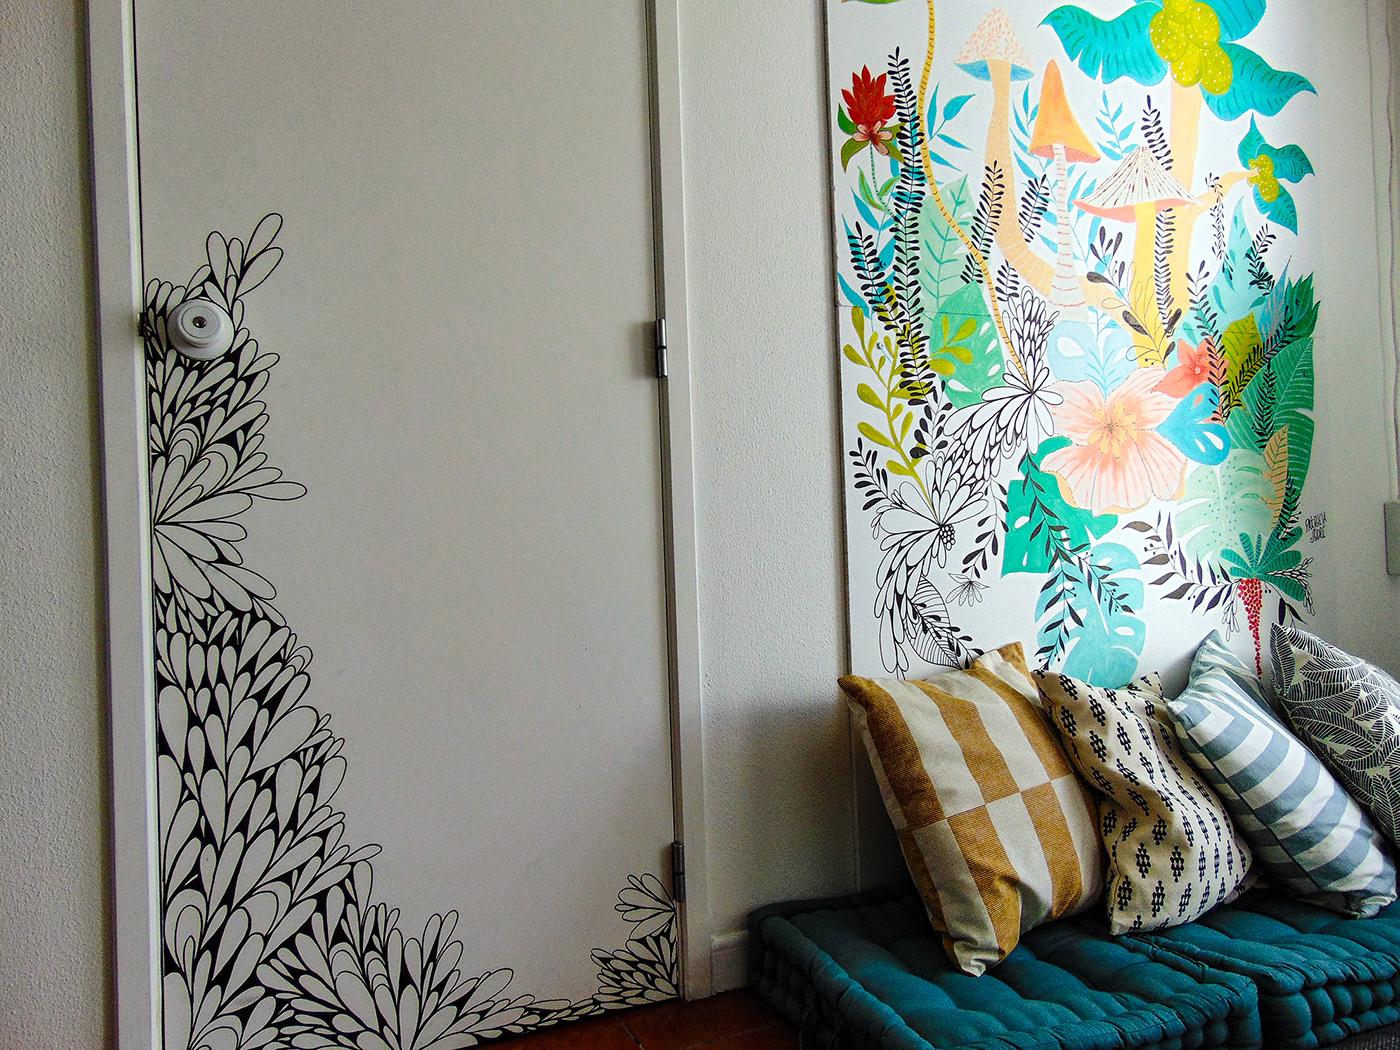 Image may contain: wall, drawing and indoor